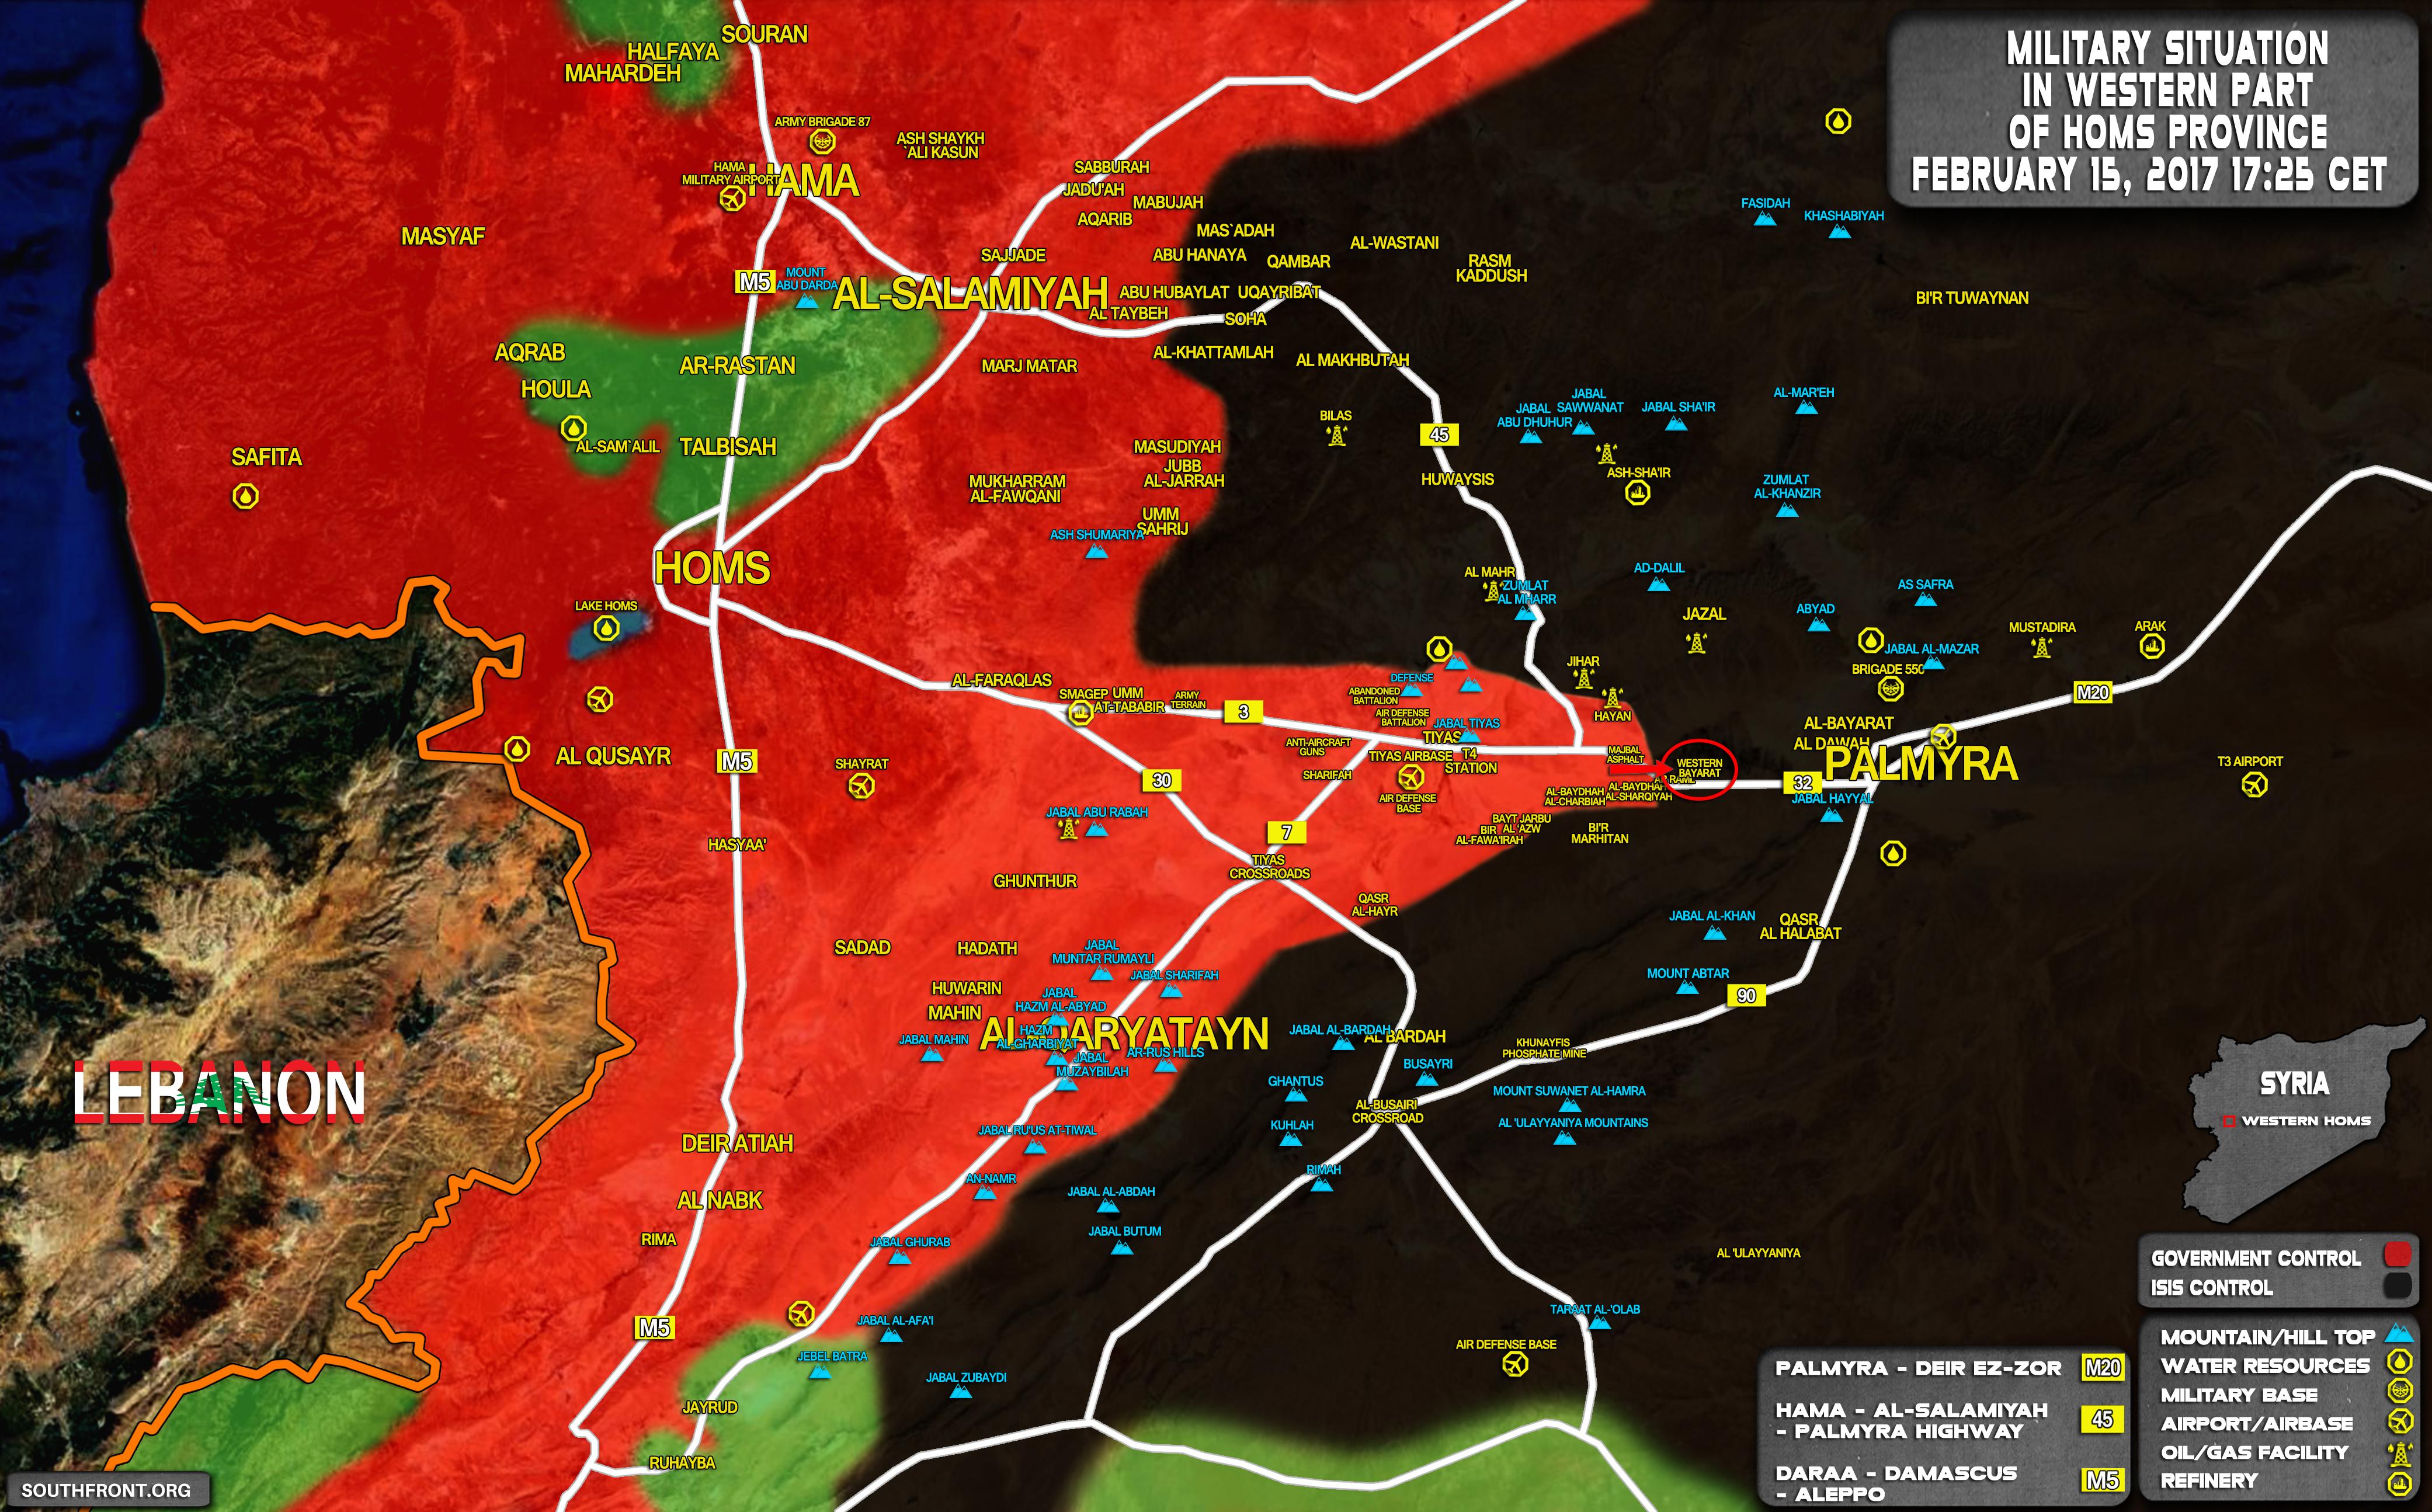 [BIZTPOL] Szíria és Irak - 3. - Page 37 15feb17-25_Homs_Province_Syria_War_Map